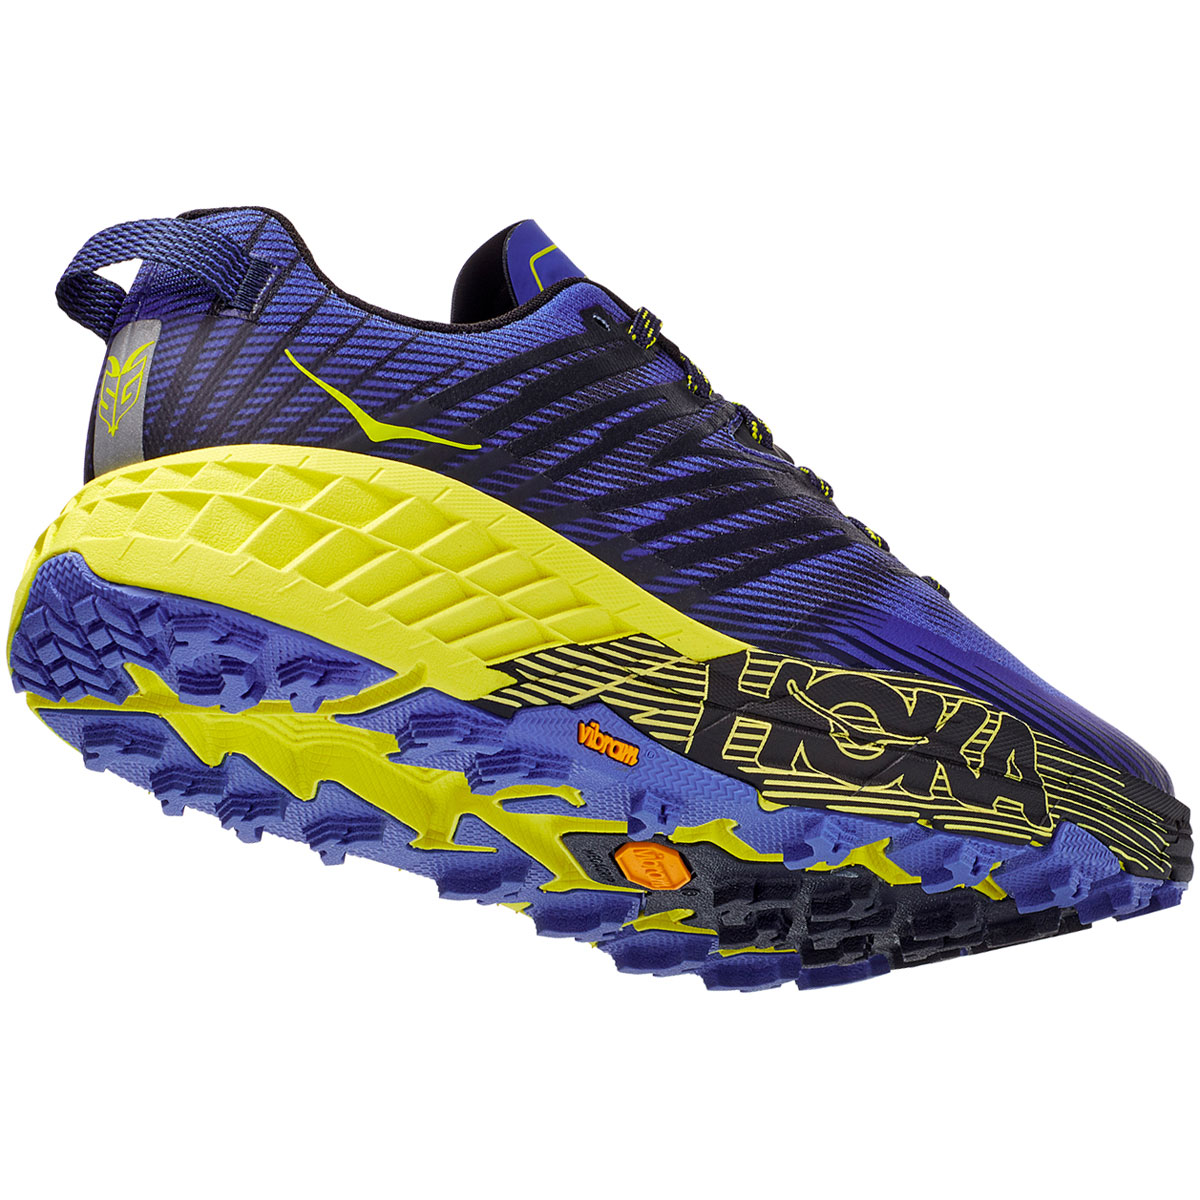 Men's Hoka One One Speedgoat 4 Trail Running Shoe - Color: Black Iris/Evening Primrose - Size: 7 - Width: Regular, Black Iris/Evening Primrose, large, image 2